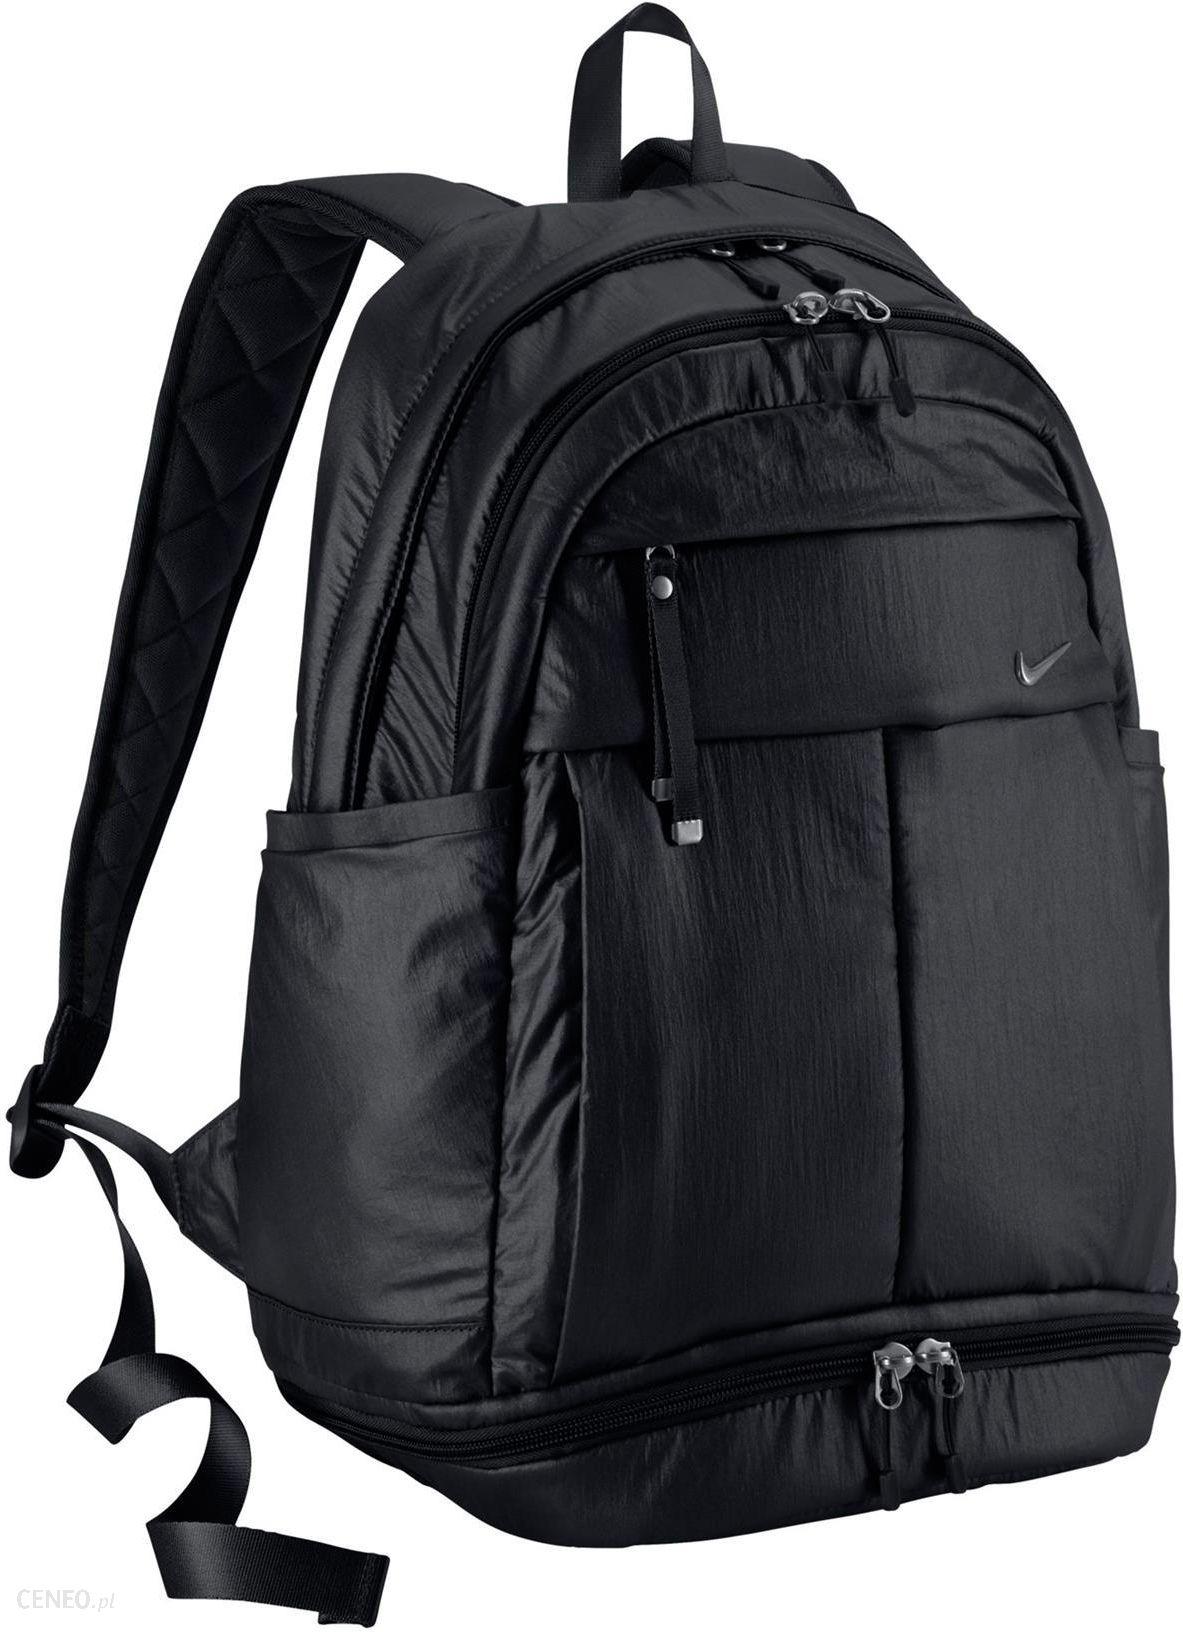 1de79cbf5be7a Plecak Nike Victory (Ba4903001) - Ceny i opinie - Ceneo.pl